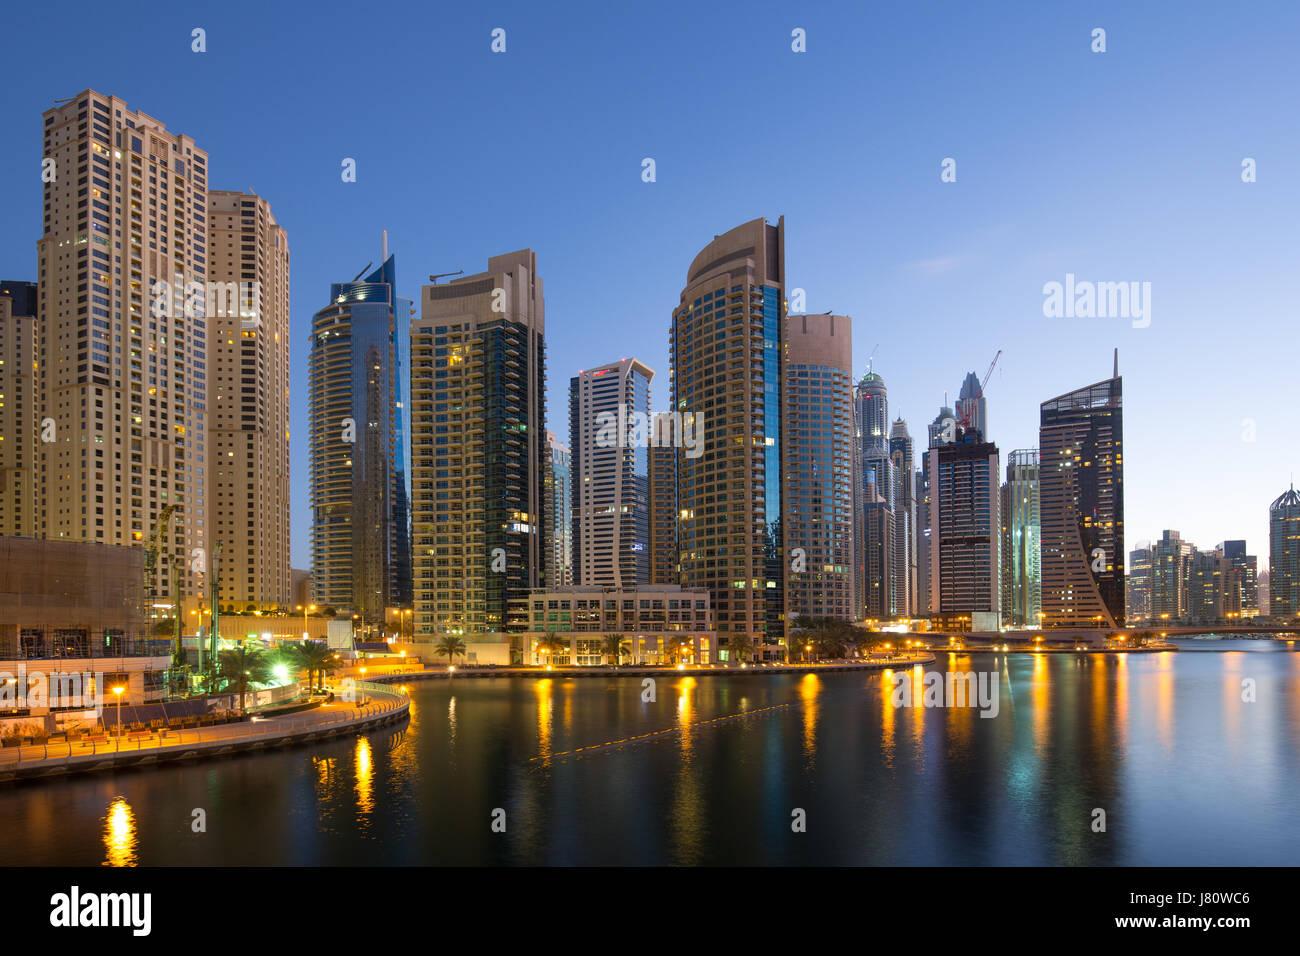 Dubai Marina skyscraper skyscrapers twilight night blue hour city UAE - Stock Image